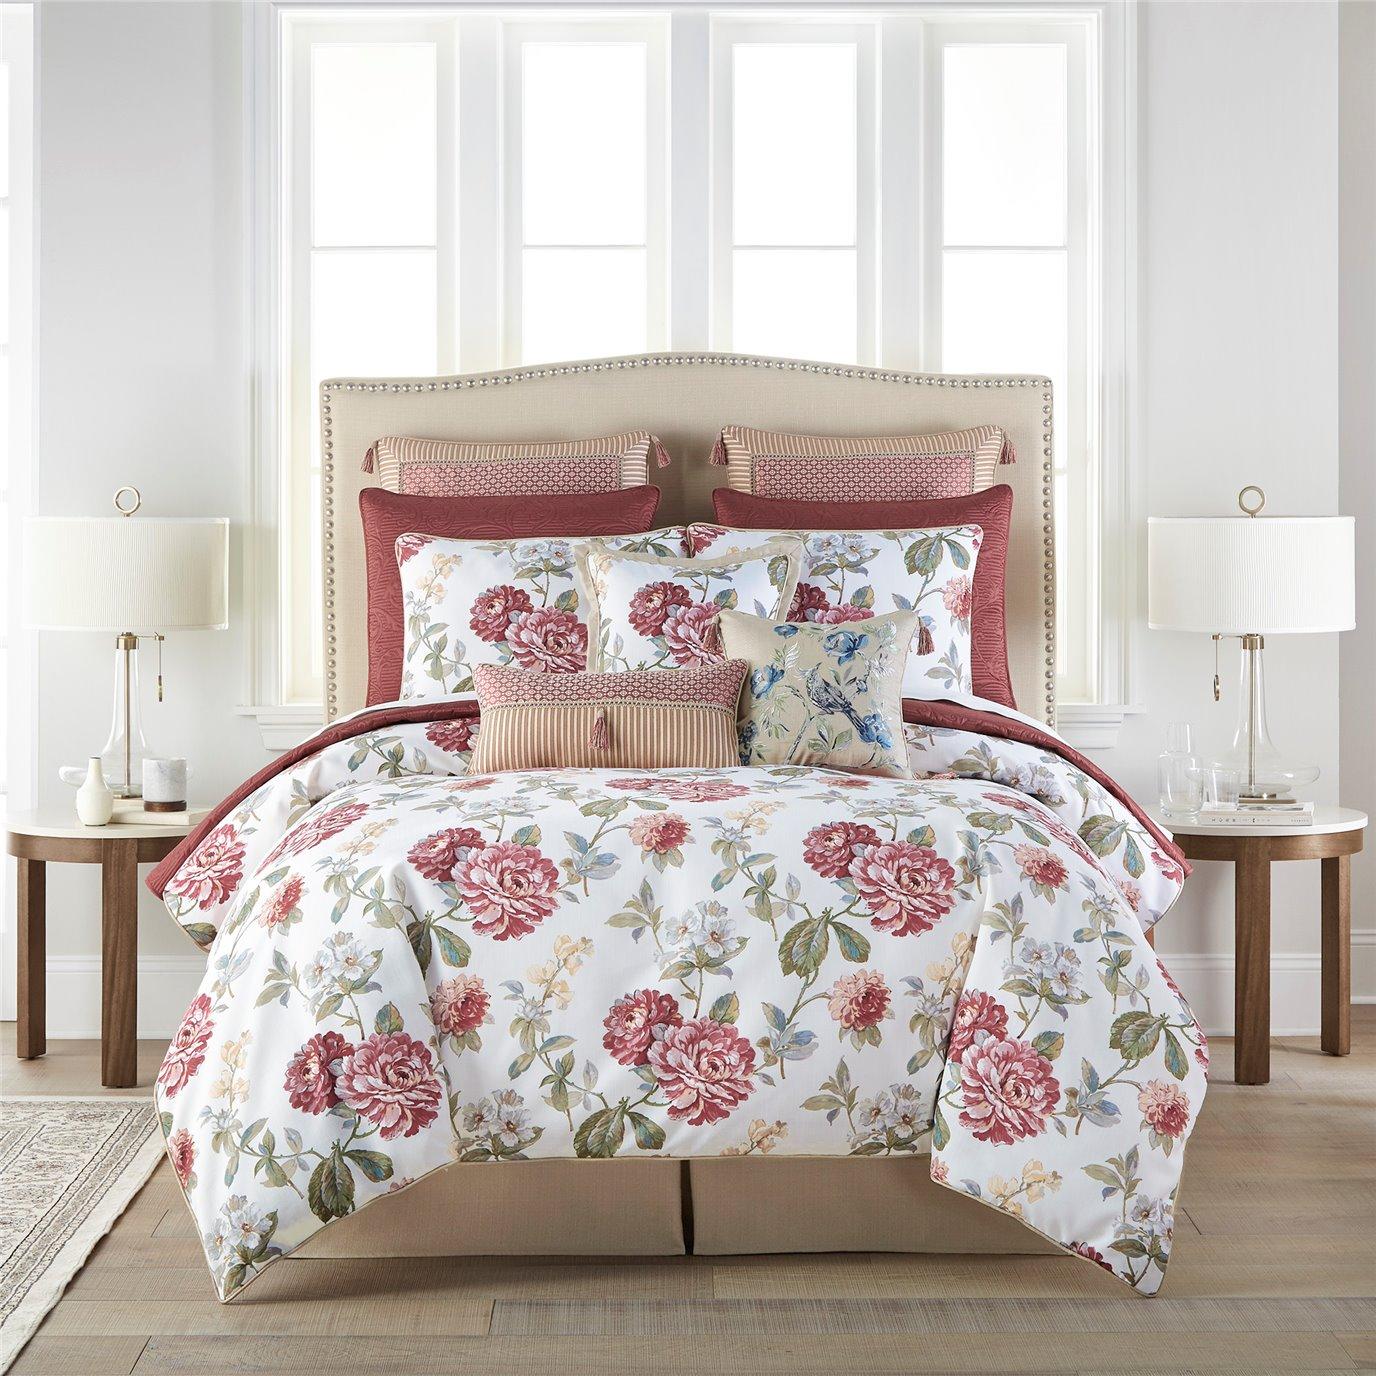 Croscill Fleur Cal King 4PC Comforter Set